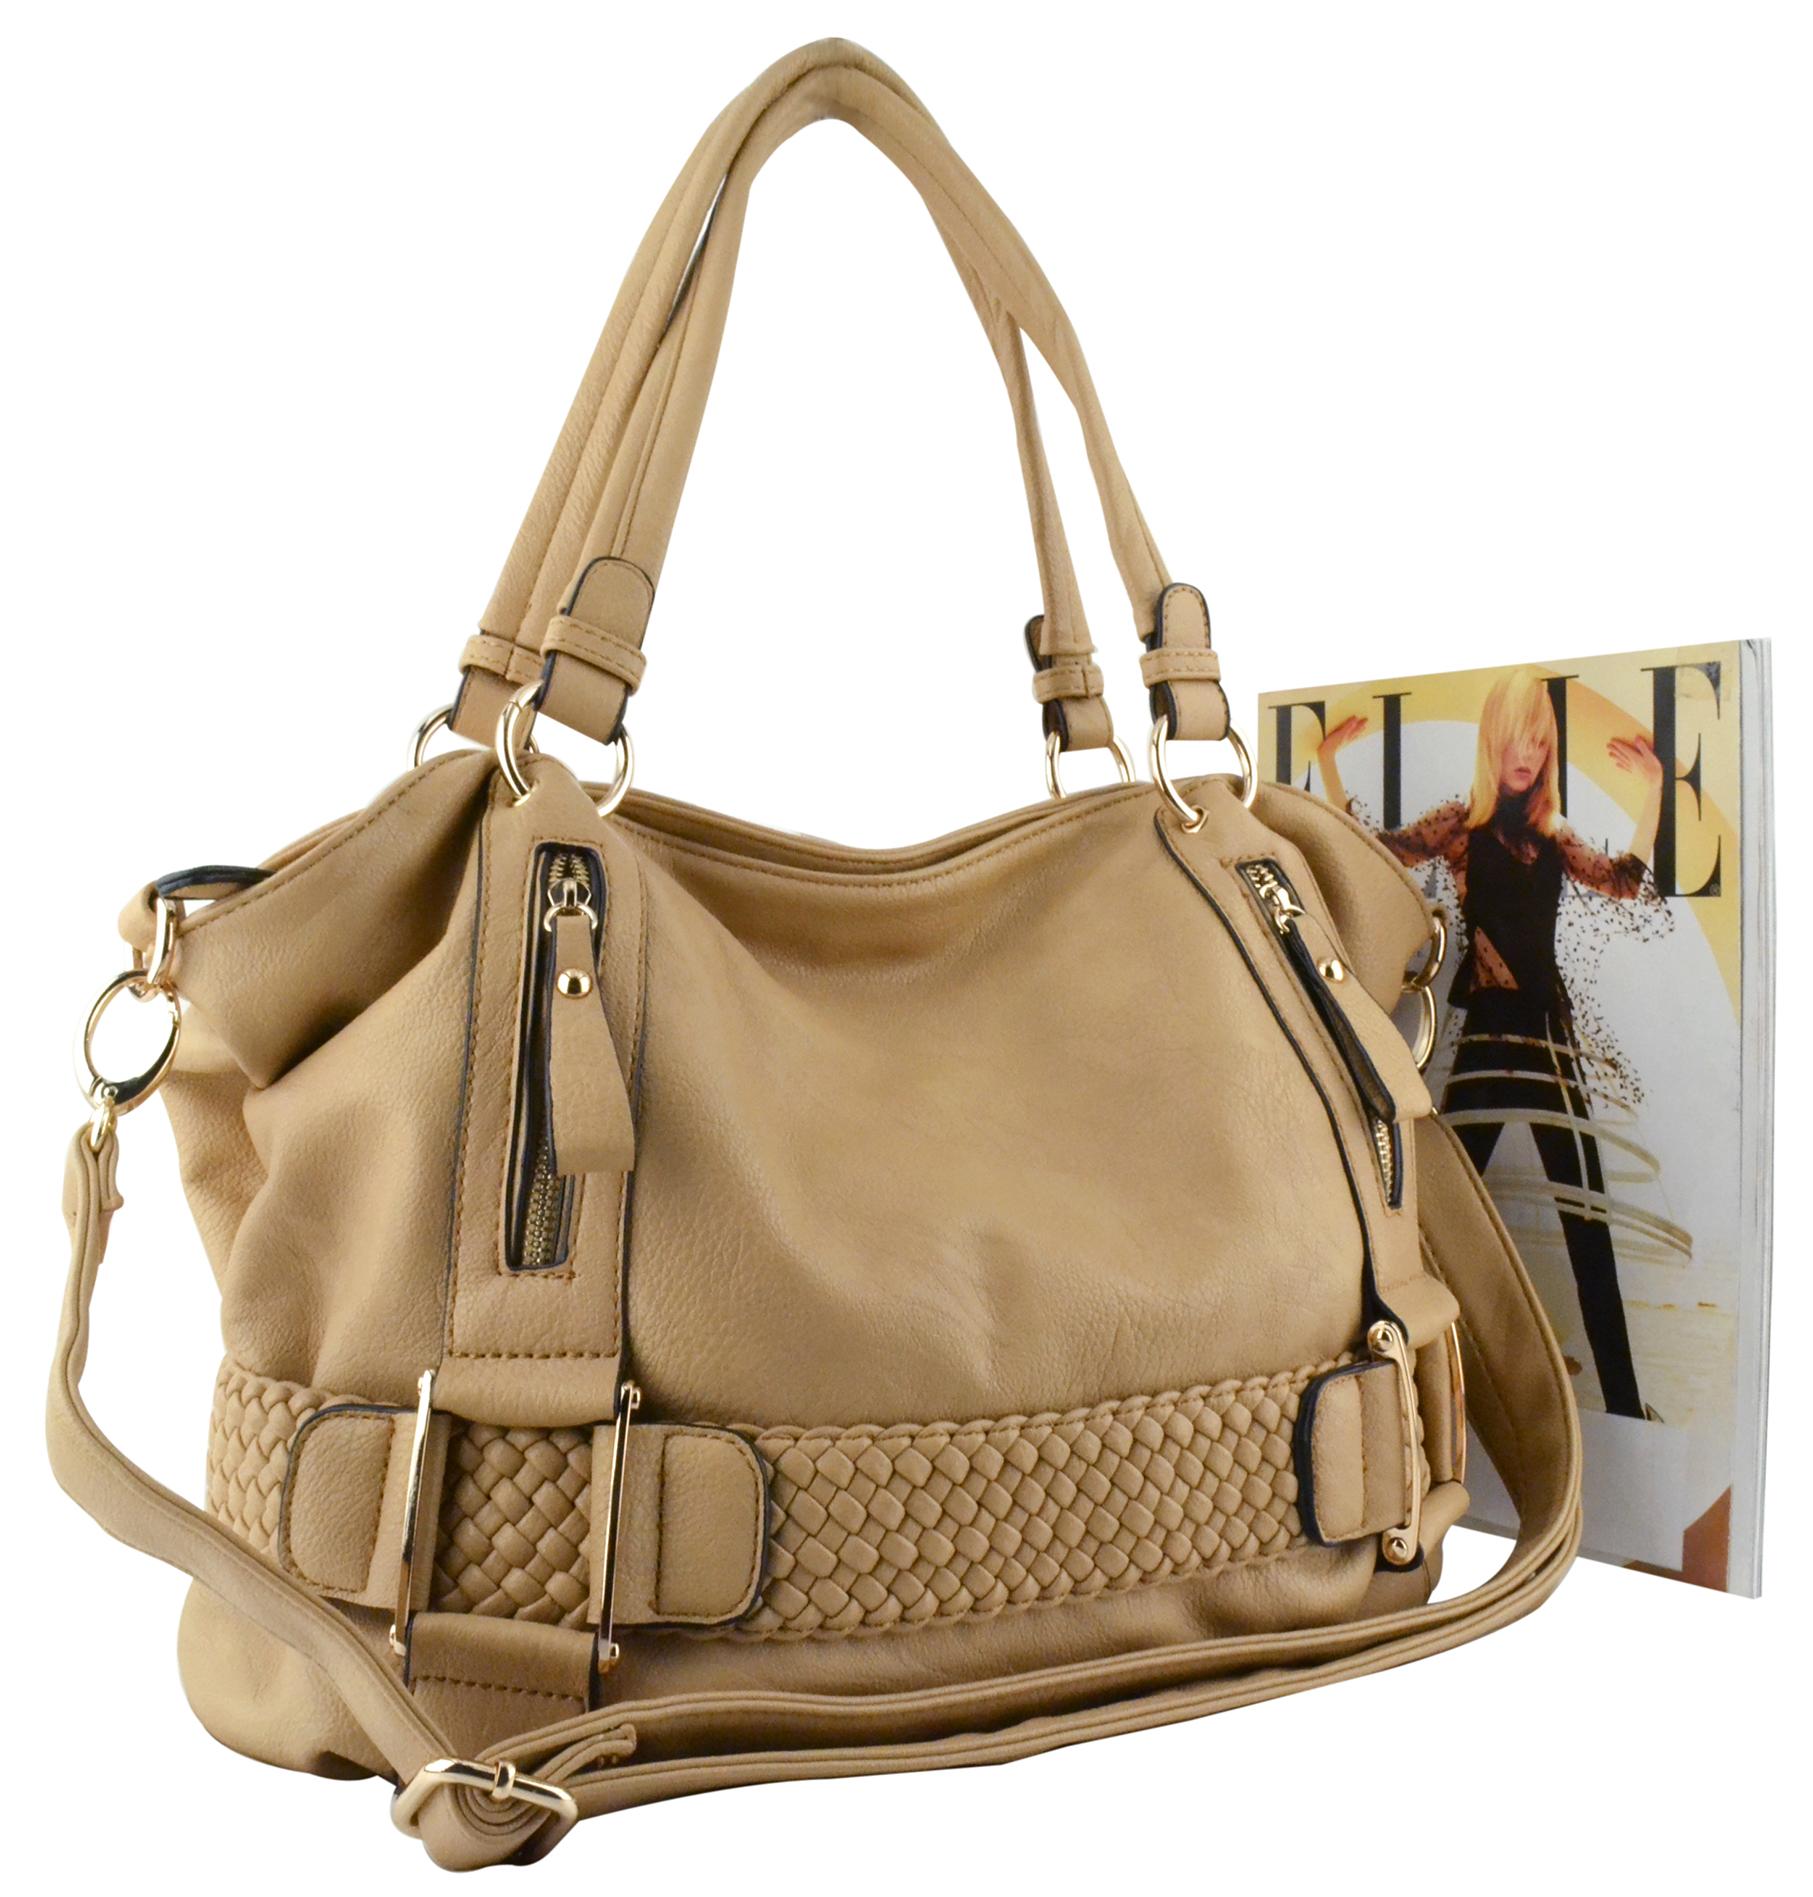 SAMANTHA Beige Soft Hobo handbag 4